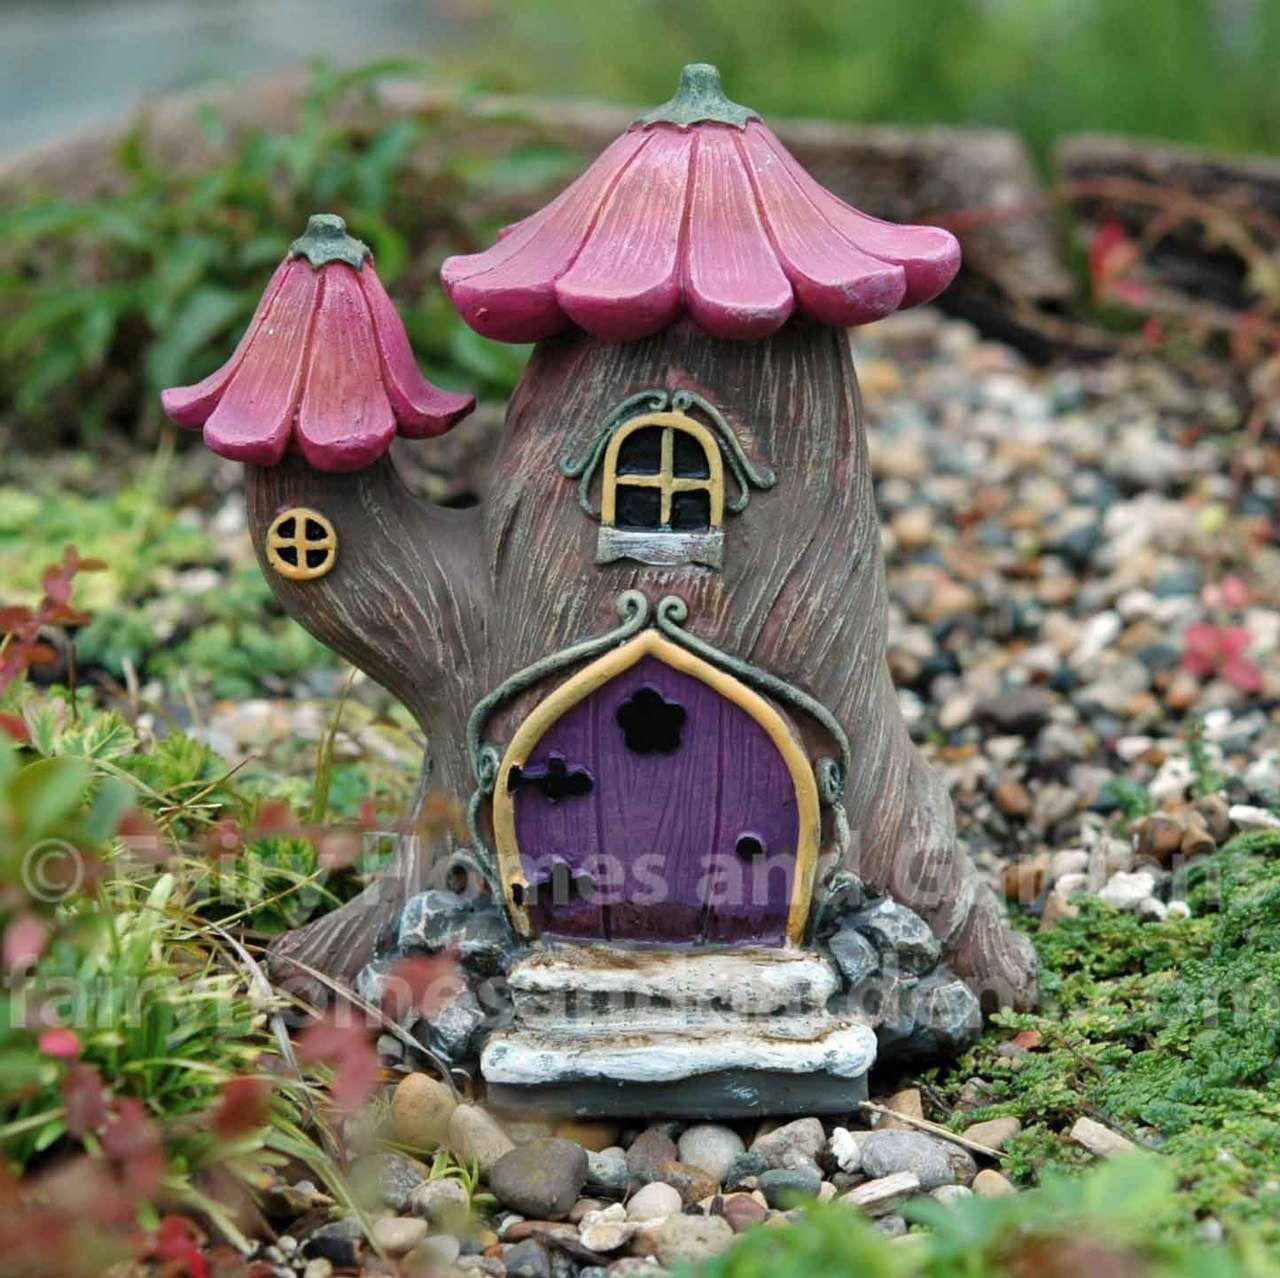 Fairy Homes and Gardens - Miniature Fairytale Tree House, $14.25 (https://www.fairyhomesandgardens.com/miniature-fairytale-tree-house/)